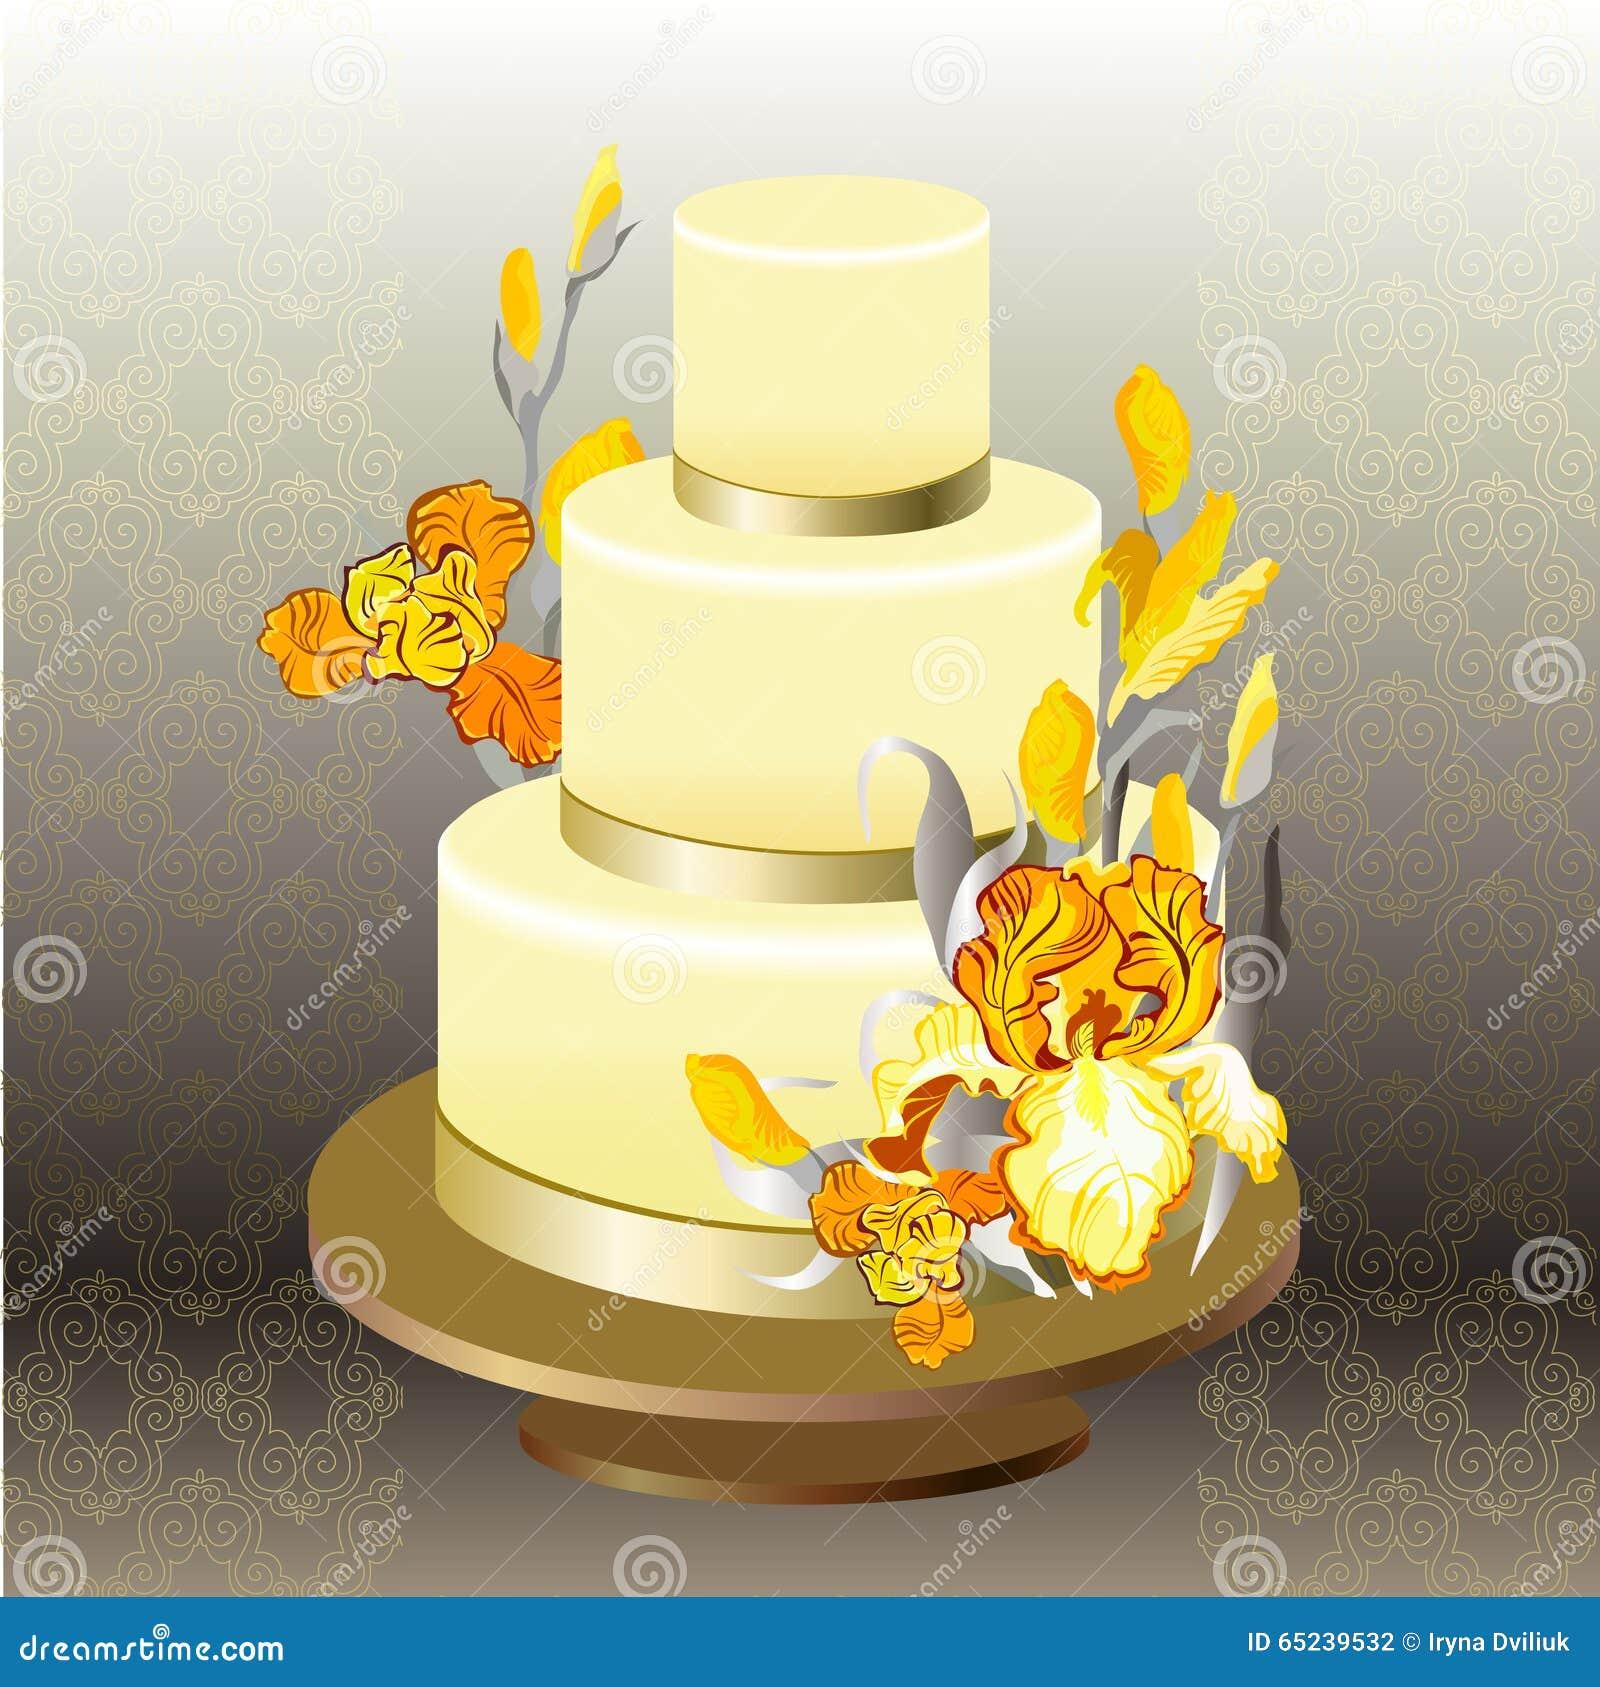 Wedding cake with yellow iris flower design stock vector wedding cake with yellow iris flower design mightylinksfo